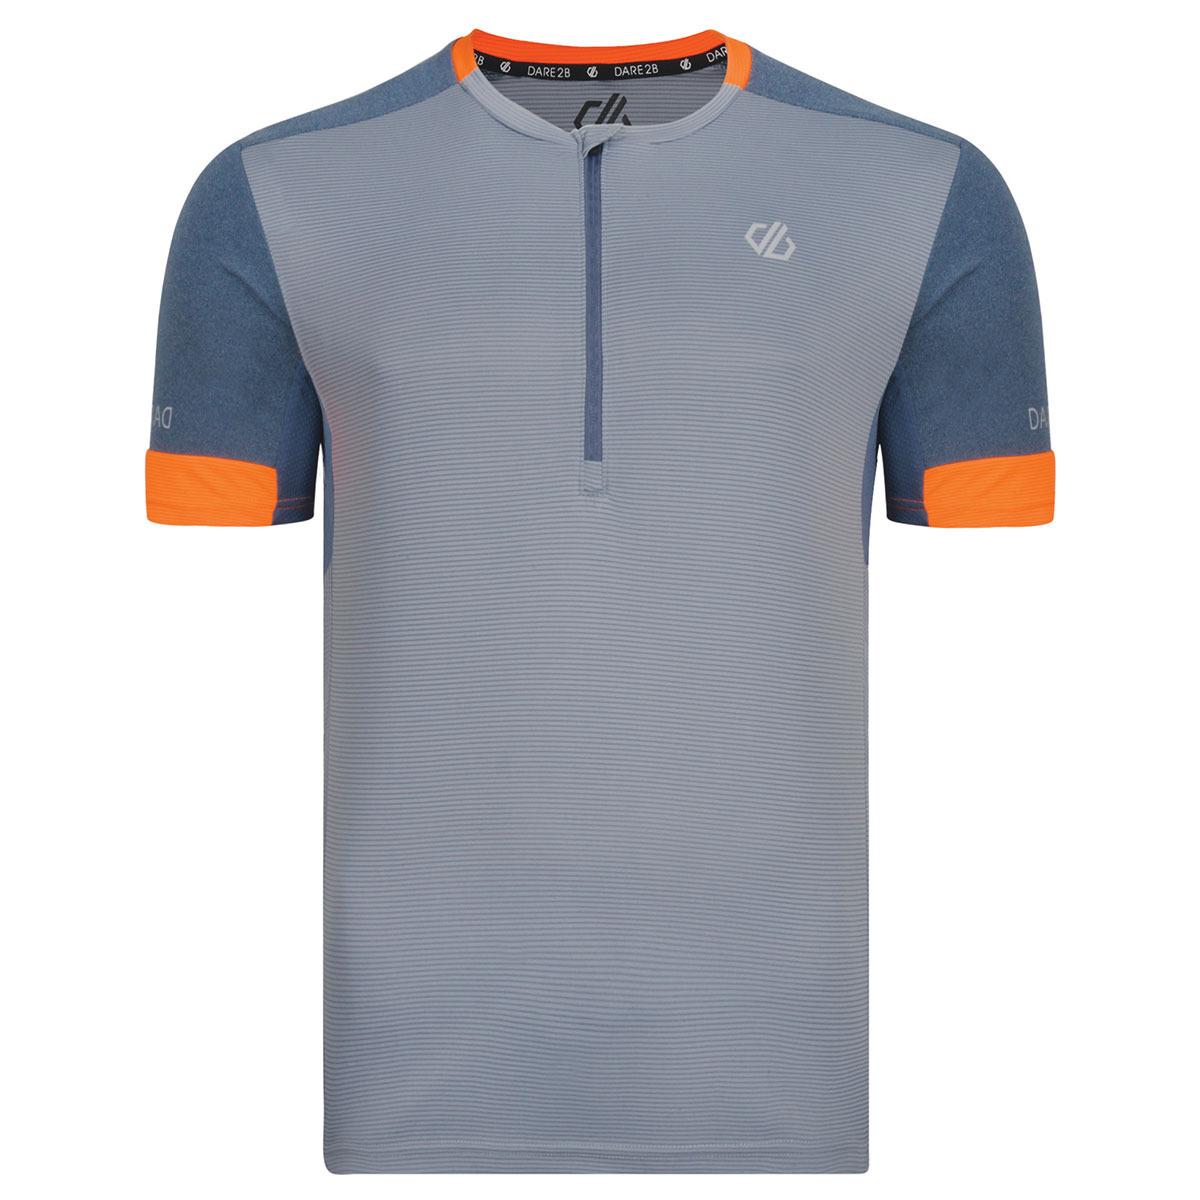 Веломайка мужская Dare 2b Equal Jersey, цвет: серый. DMT462-5PL. Размер L (52/54) веломайка мужская dare 2b equal jersey цвет зеленый dmt462 34l размер l 52 54